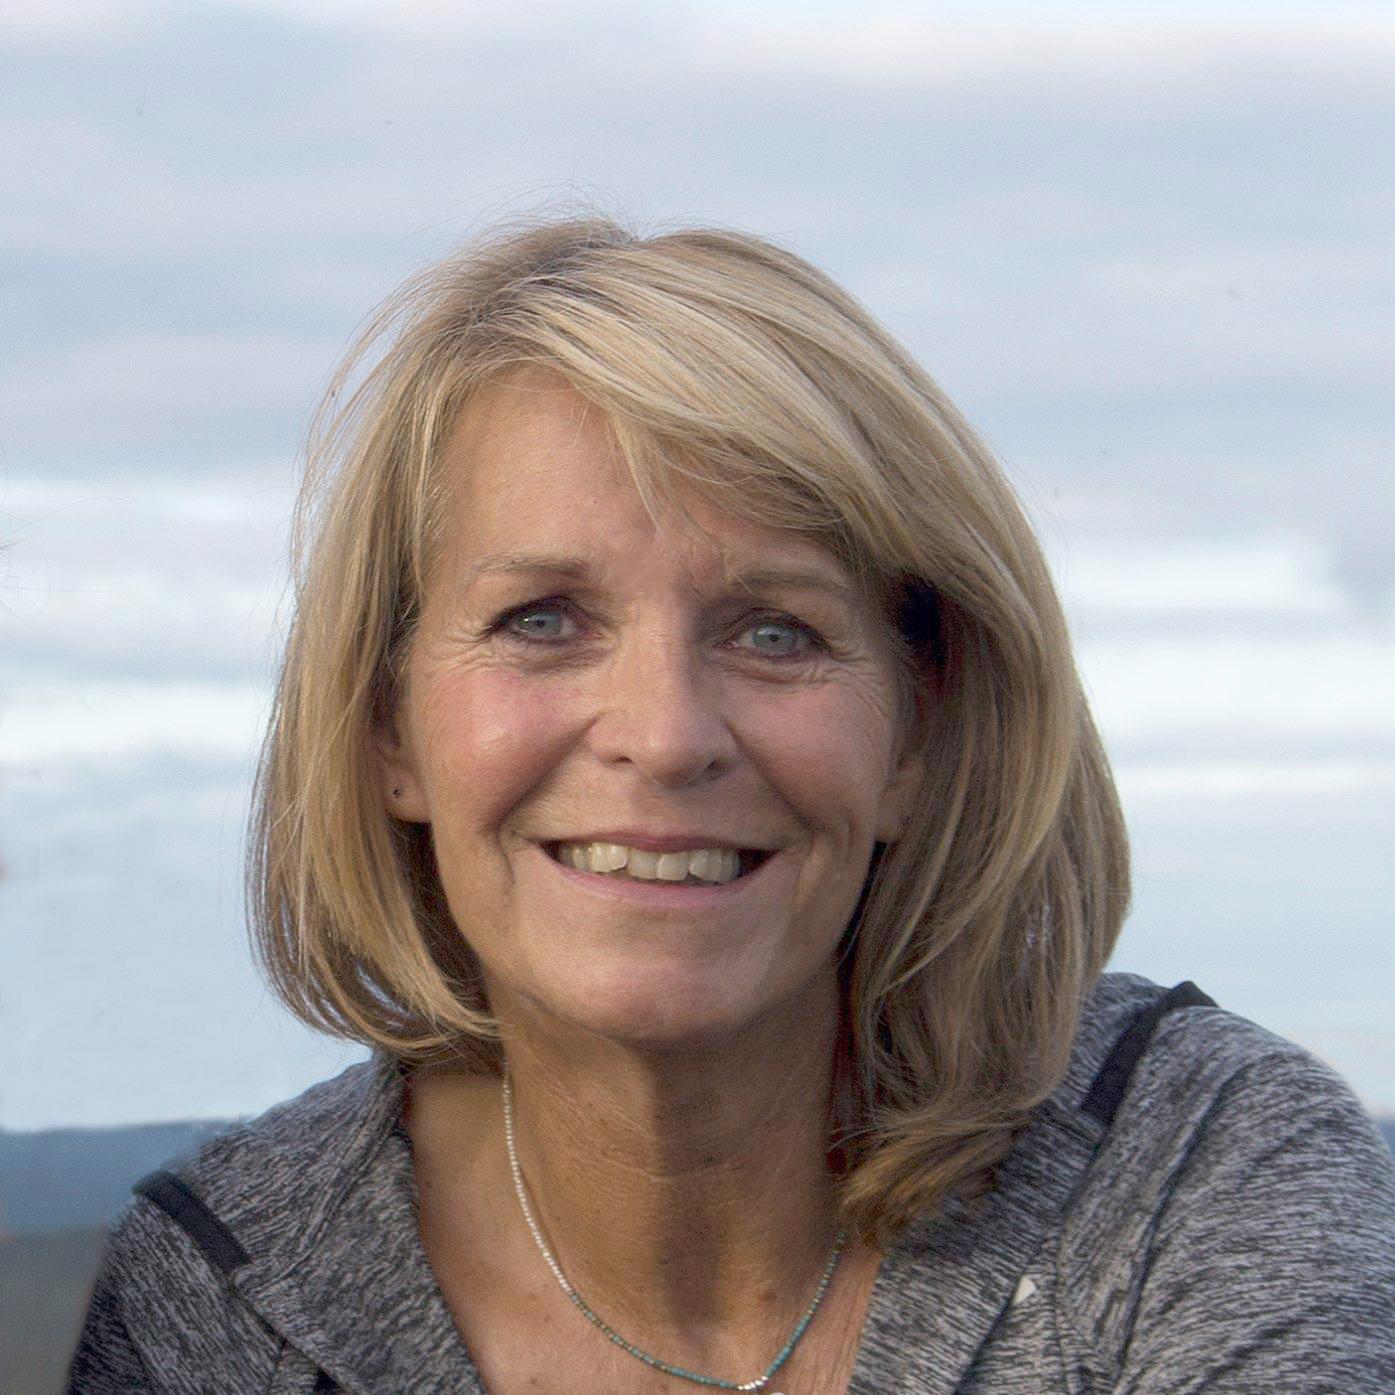 Caroline Vlietstra